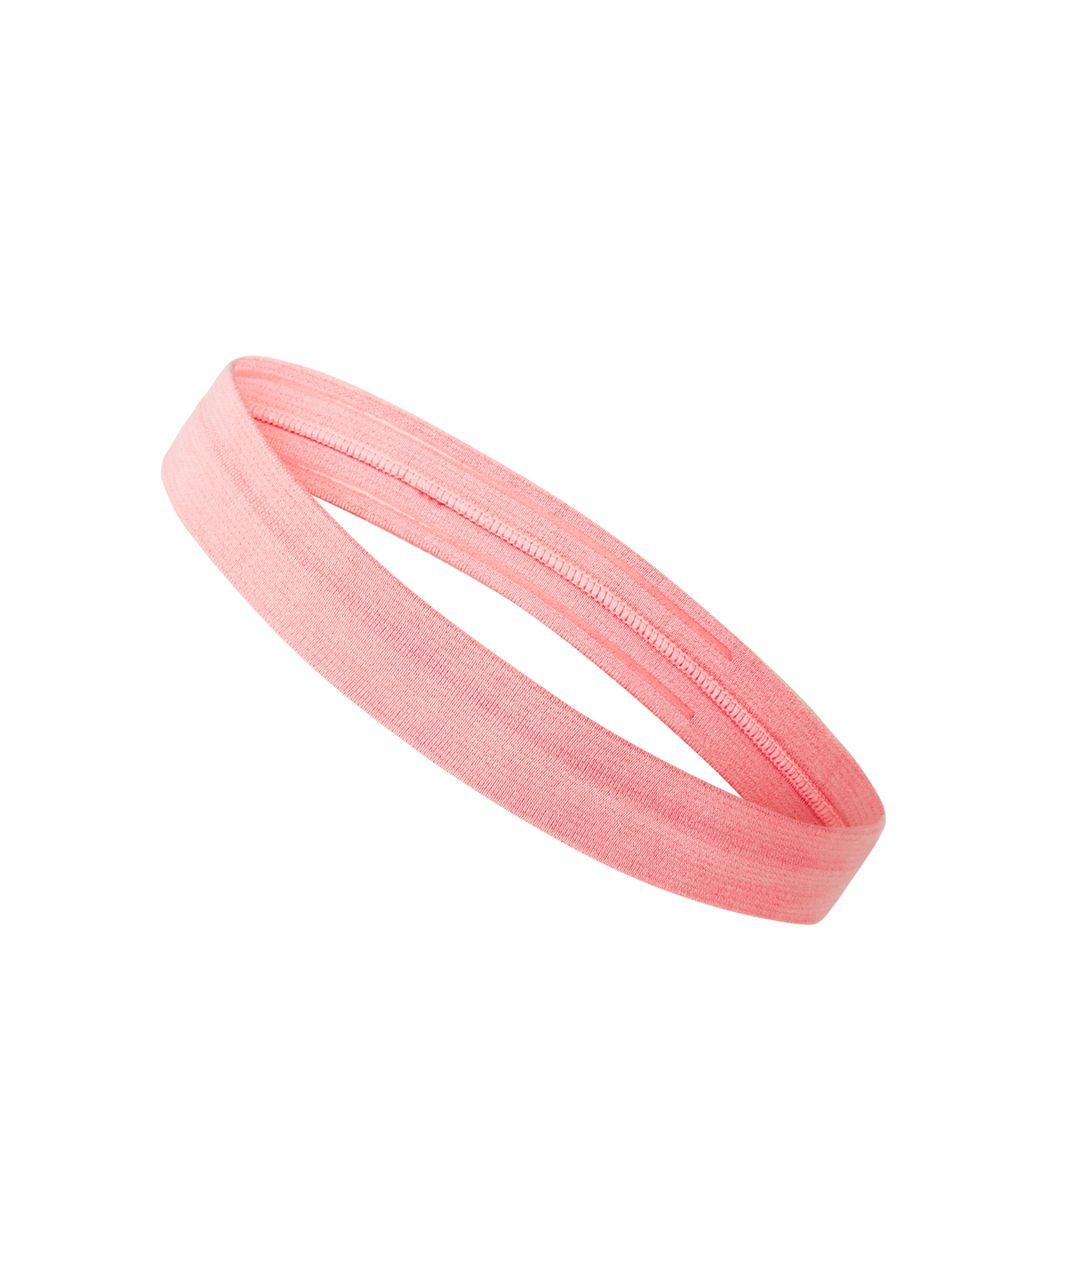 Lululemon Cardio Cross Trainer Headband - Heathered Grapefruit